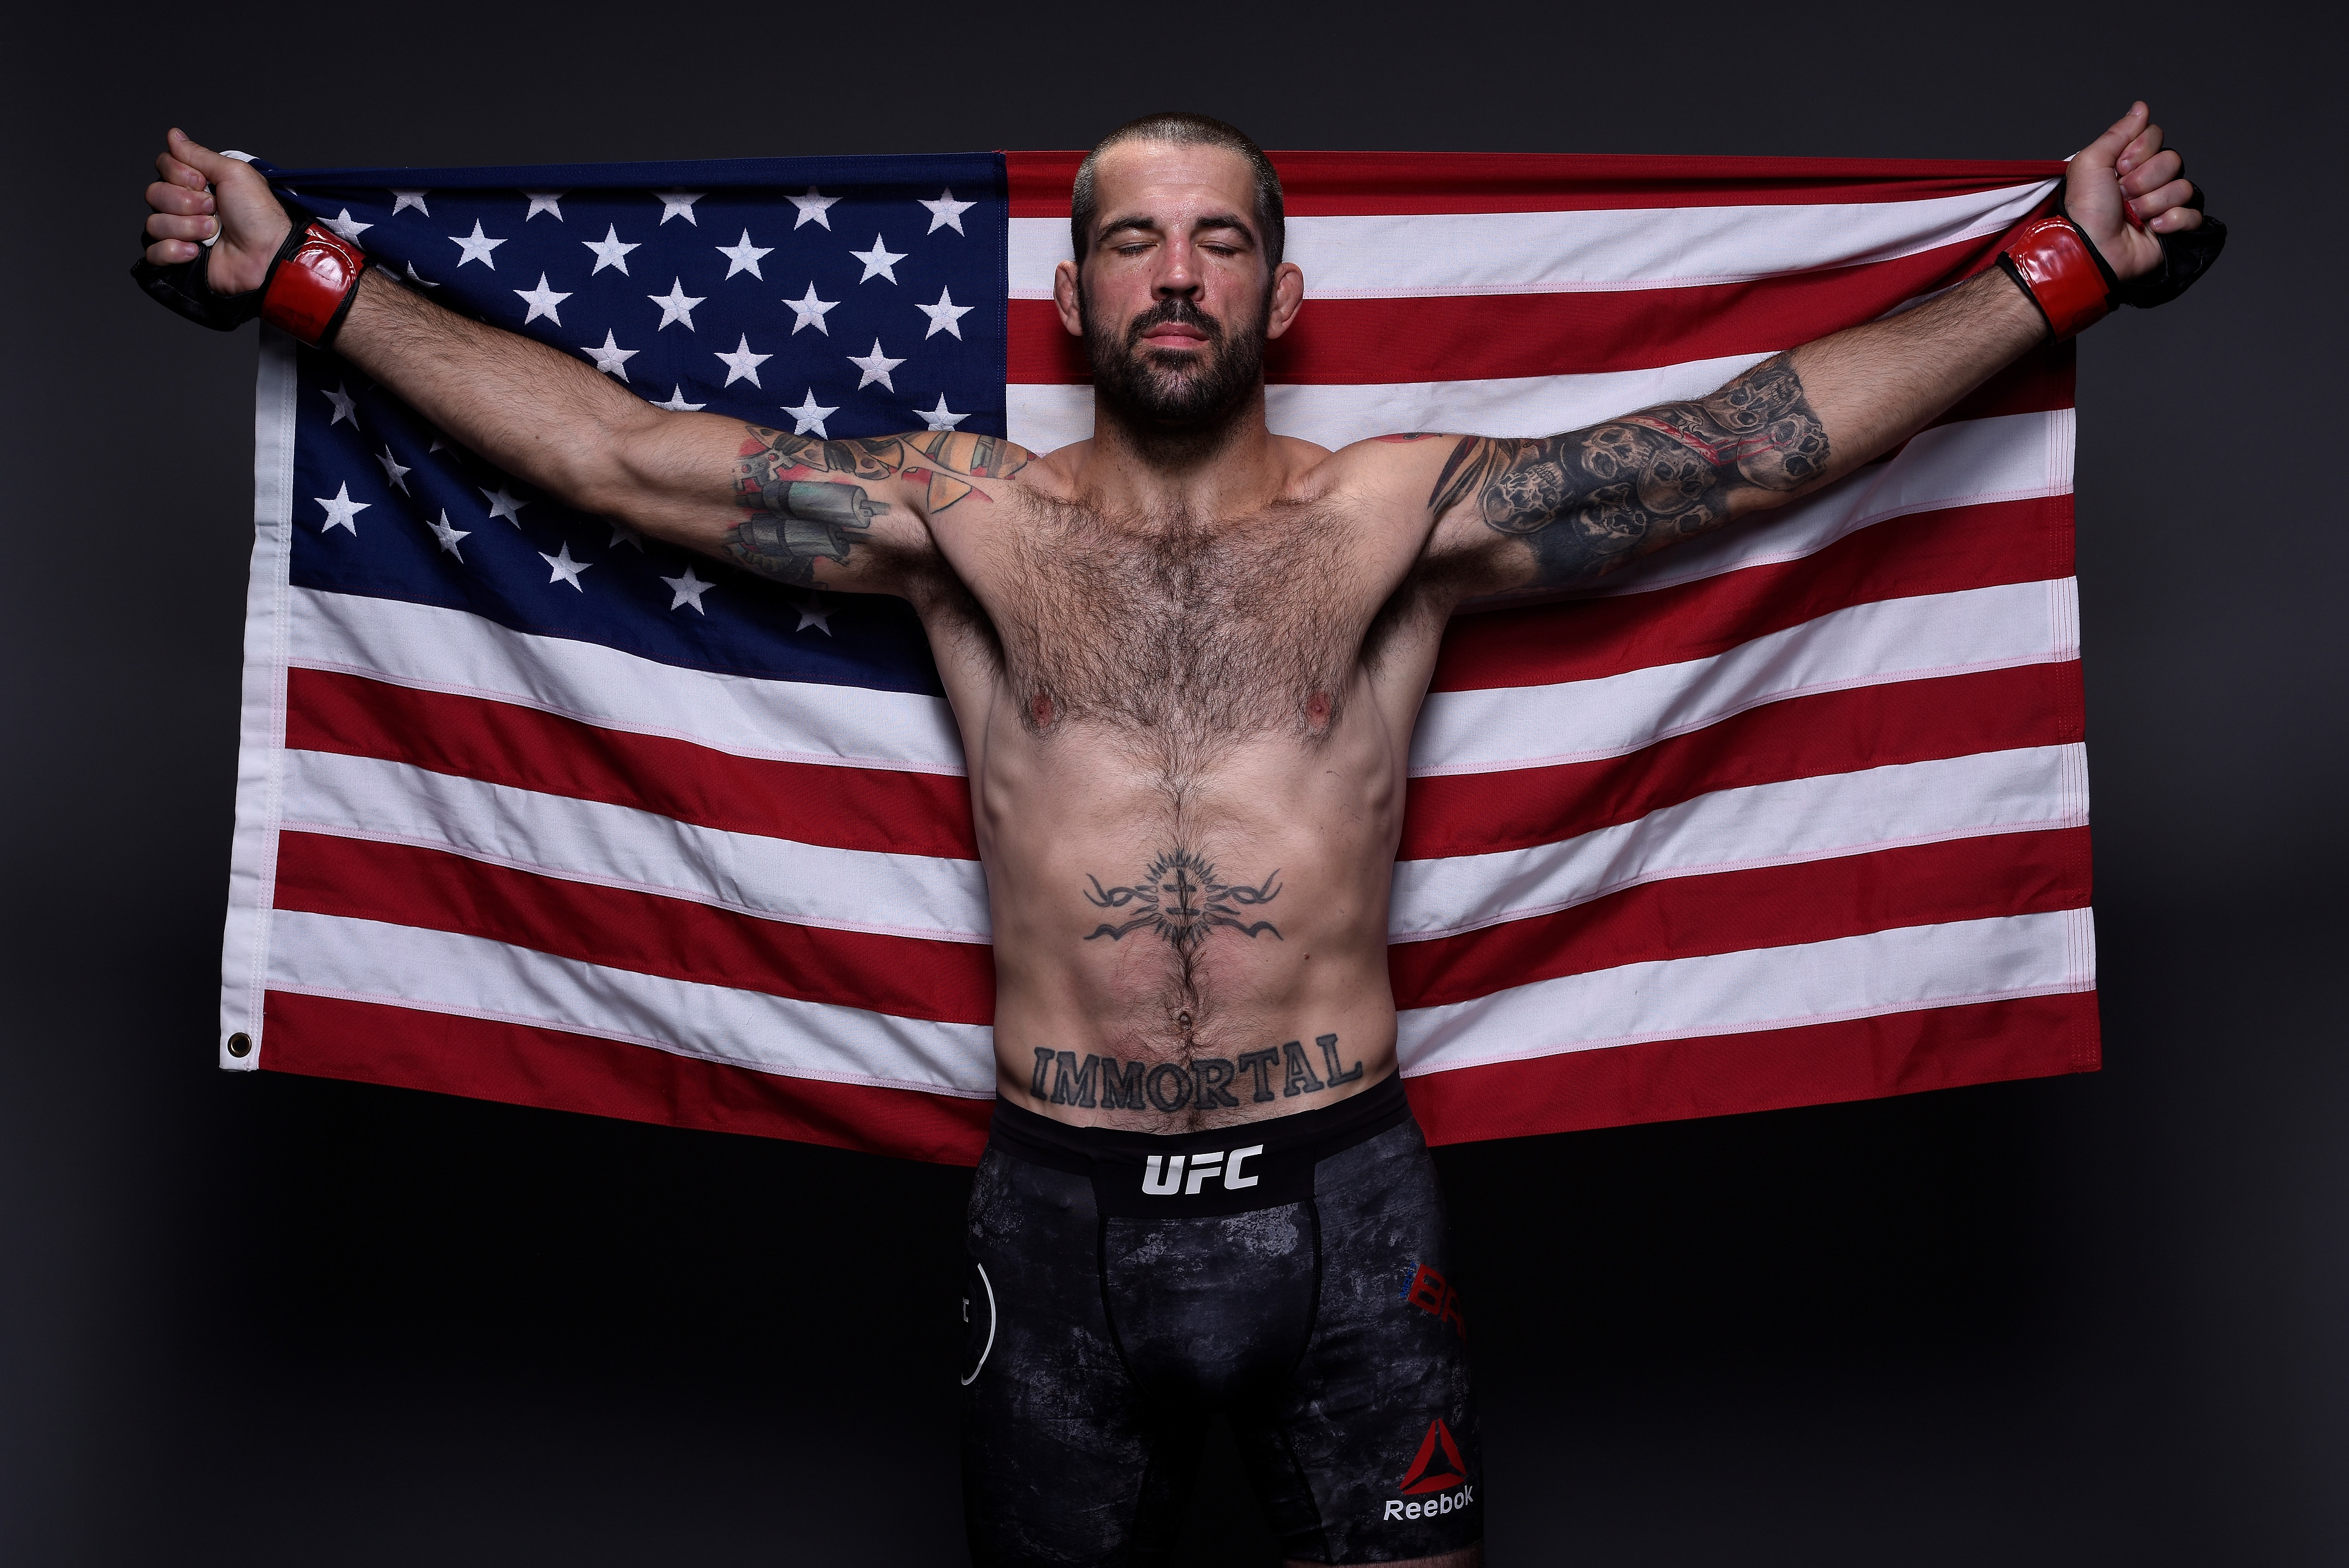 UFC Fight Night: Poirier vs Pettis